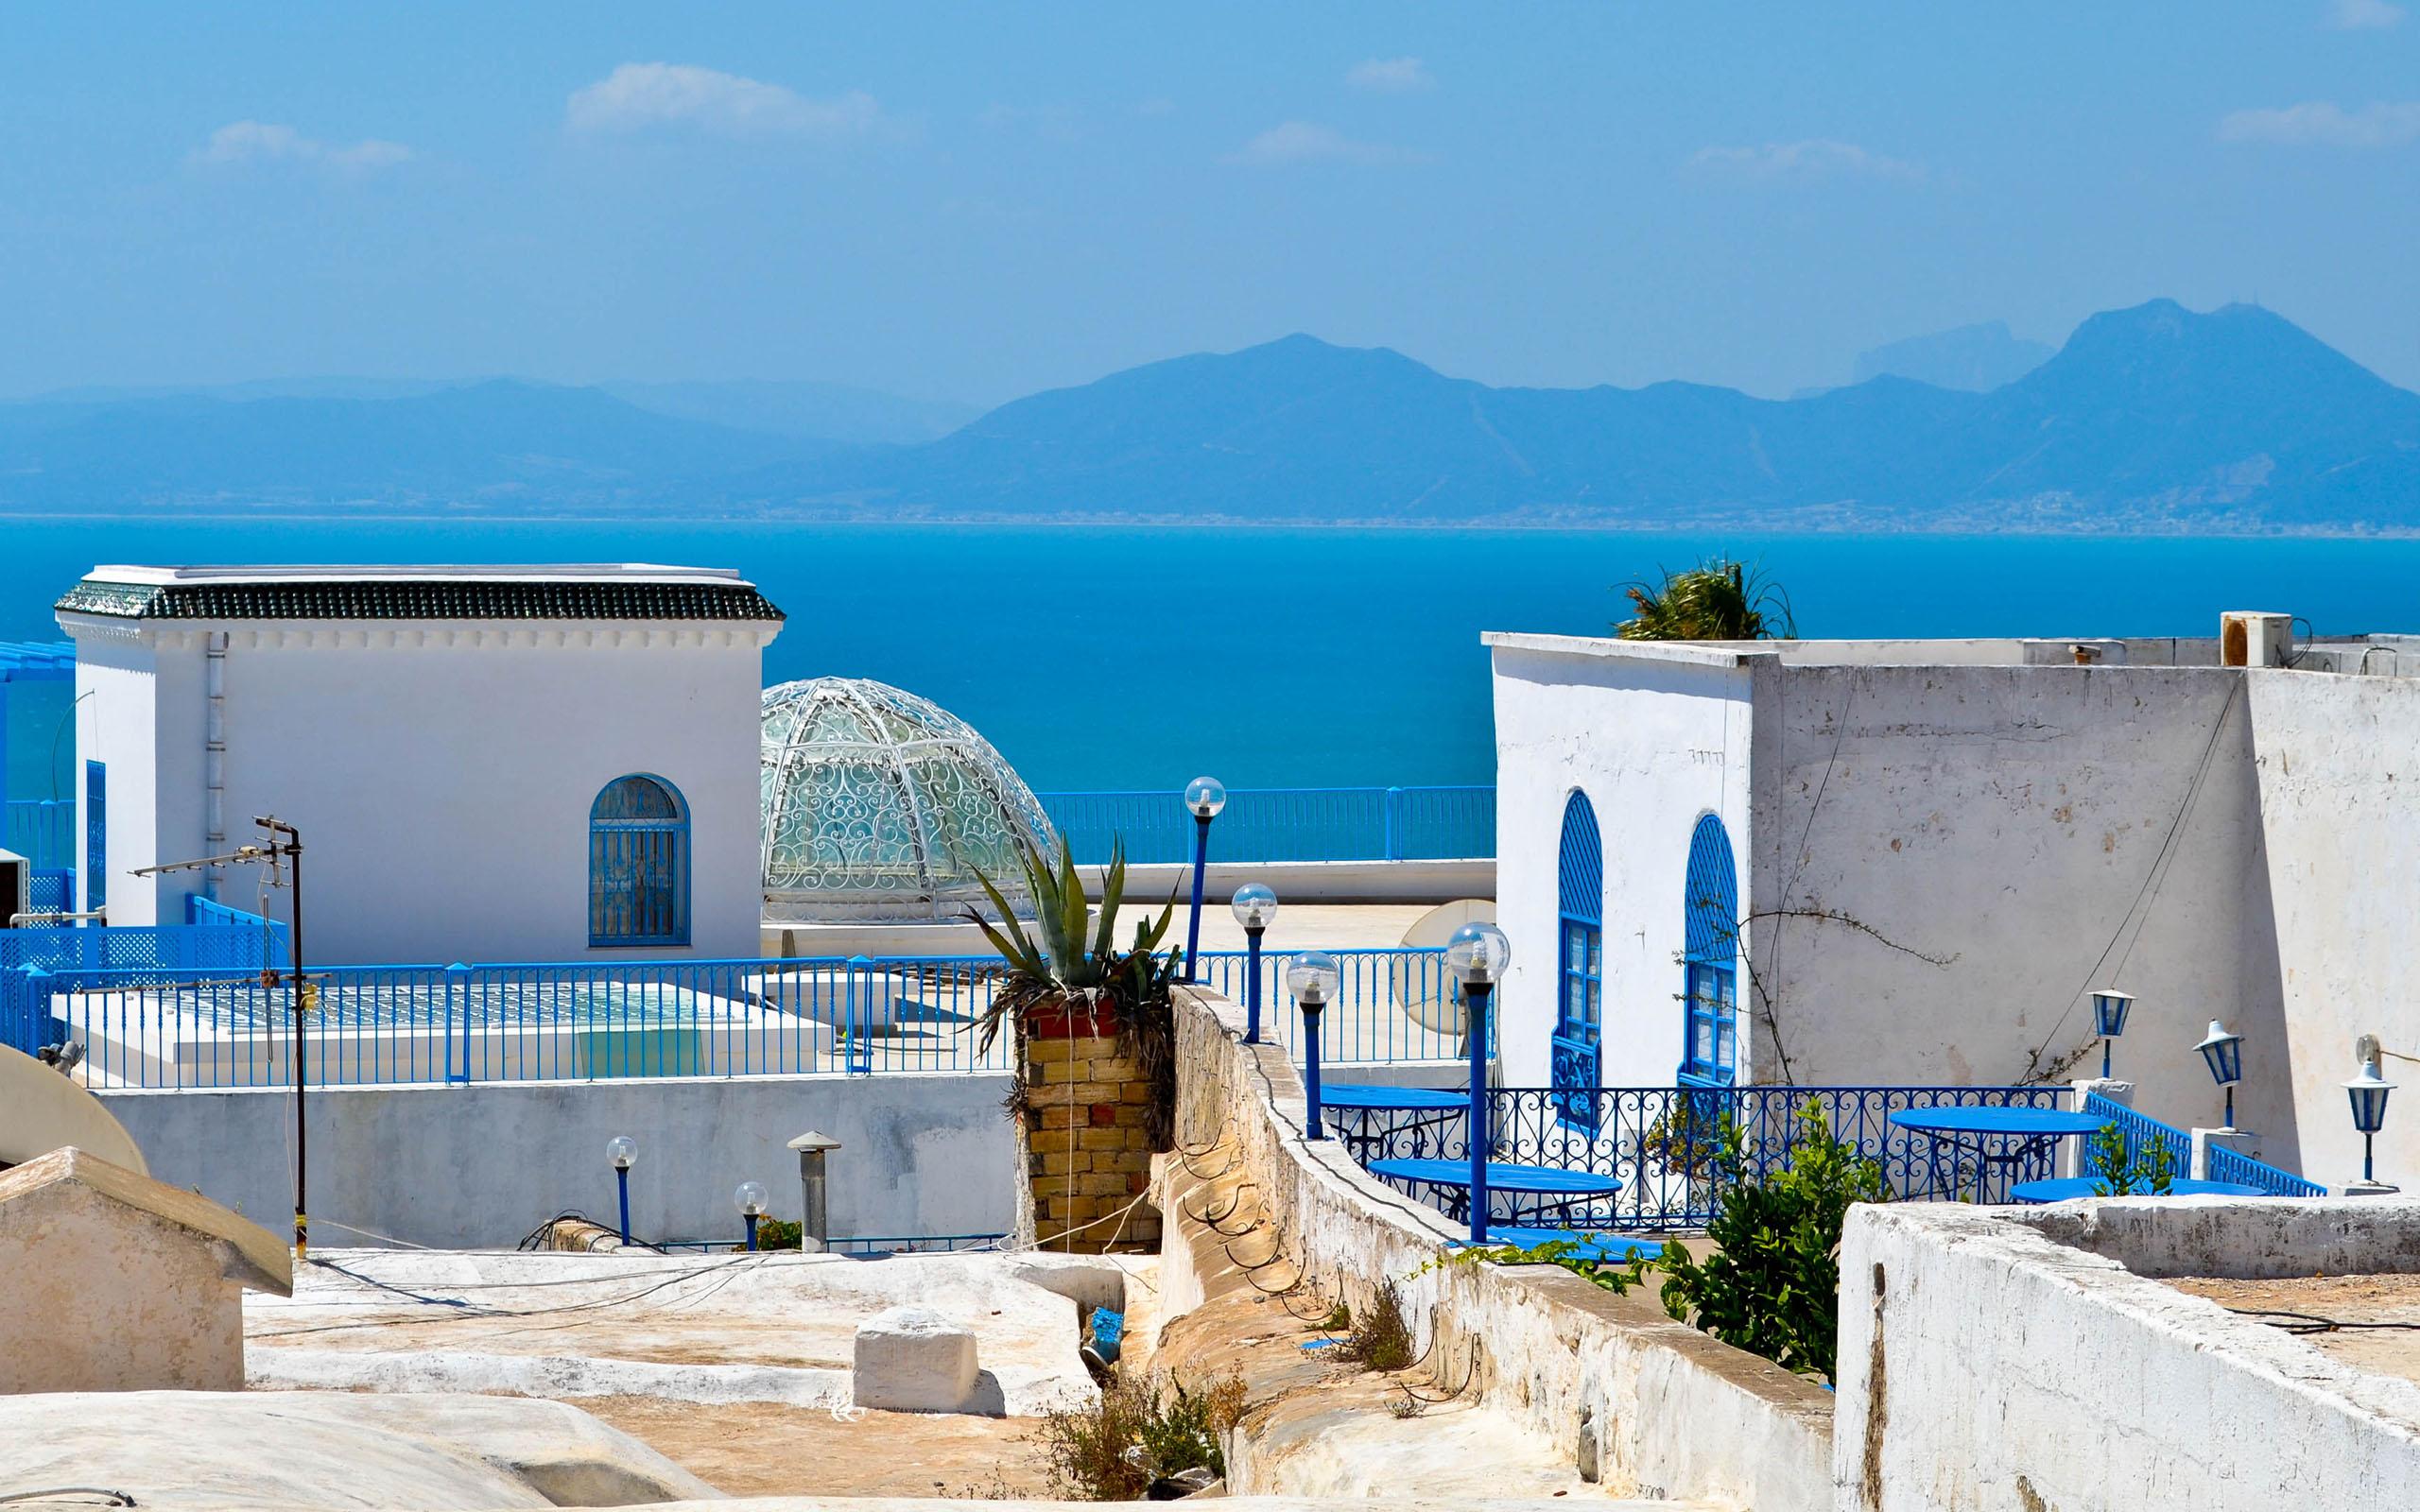 Tunisia Africa Resort Wallpaper Hd City 4k Wallpapers